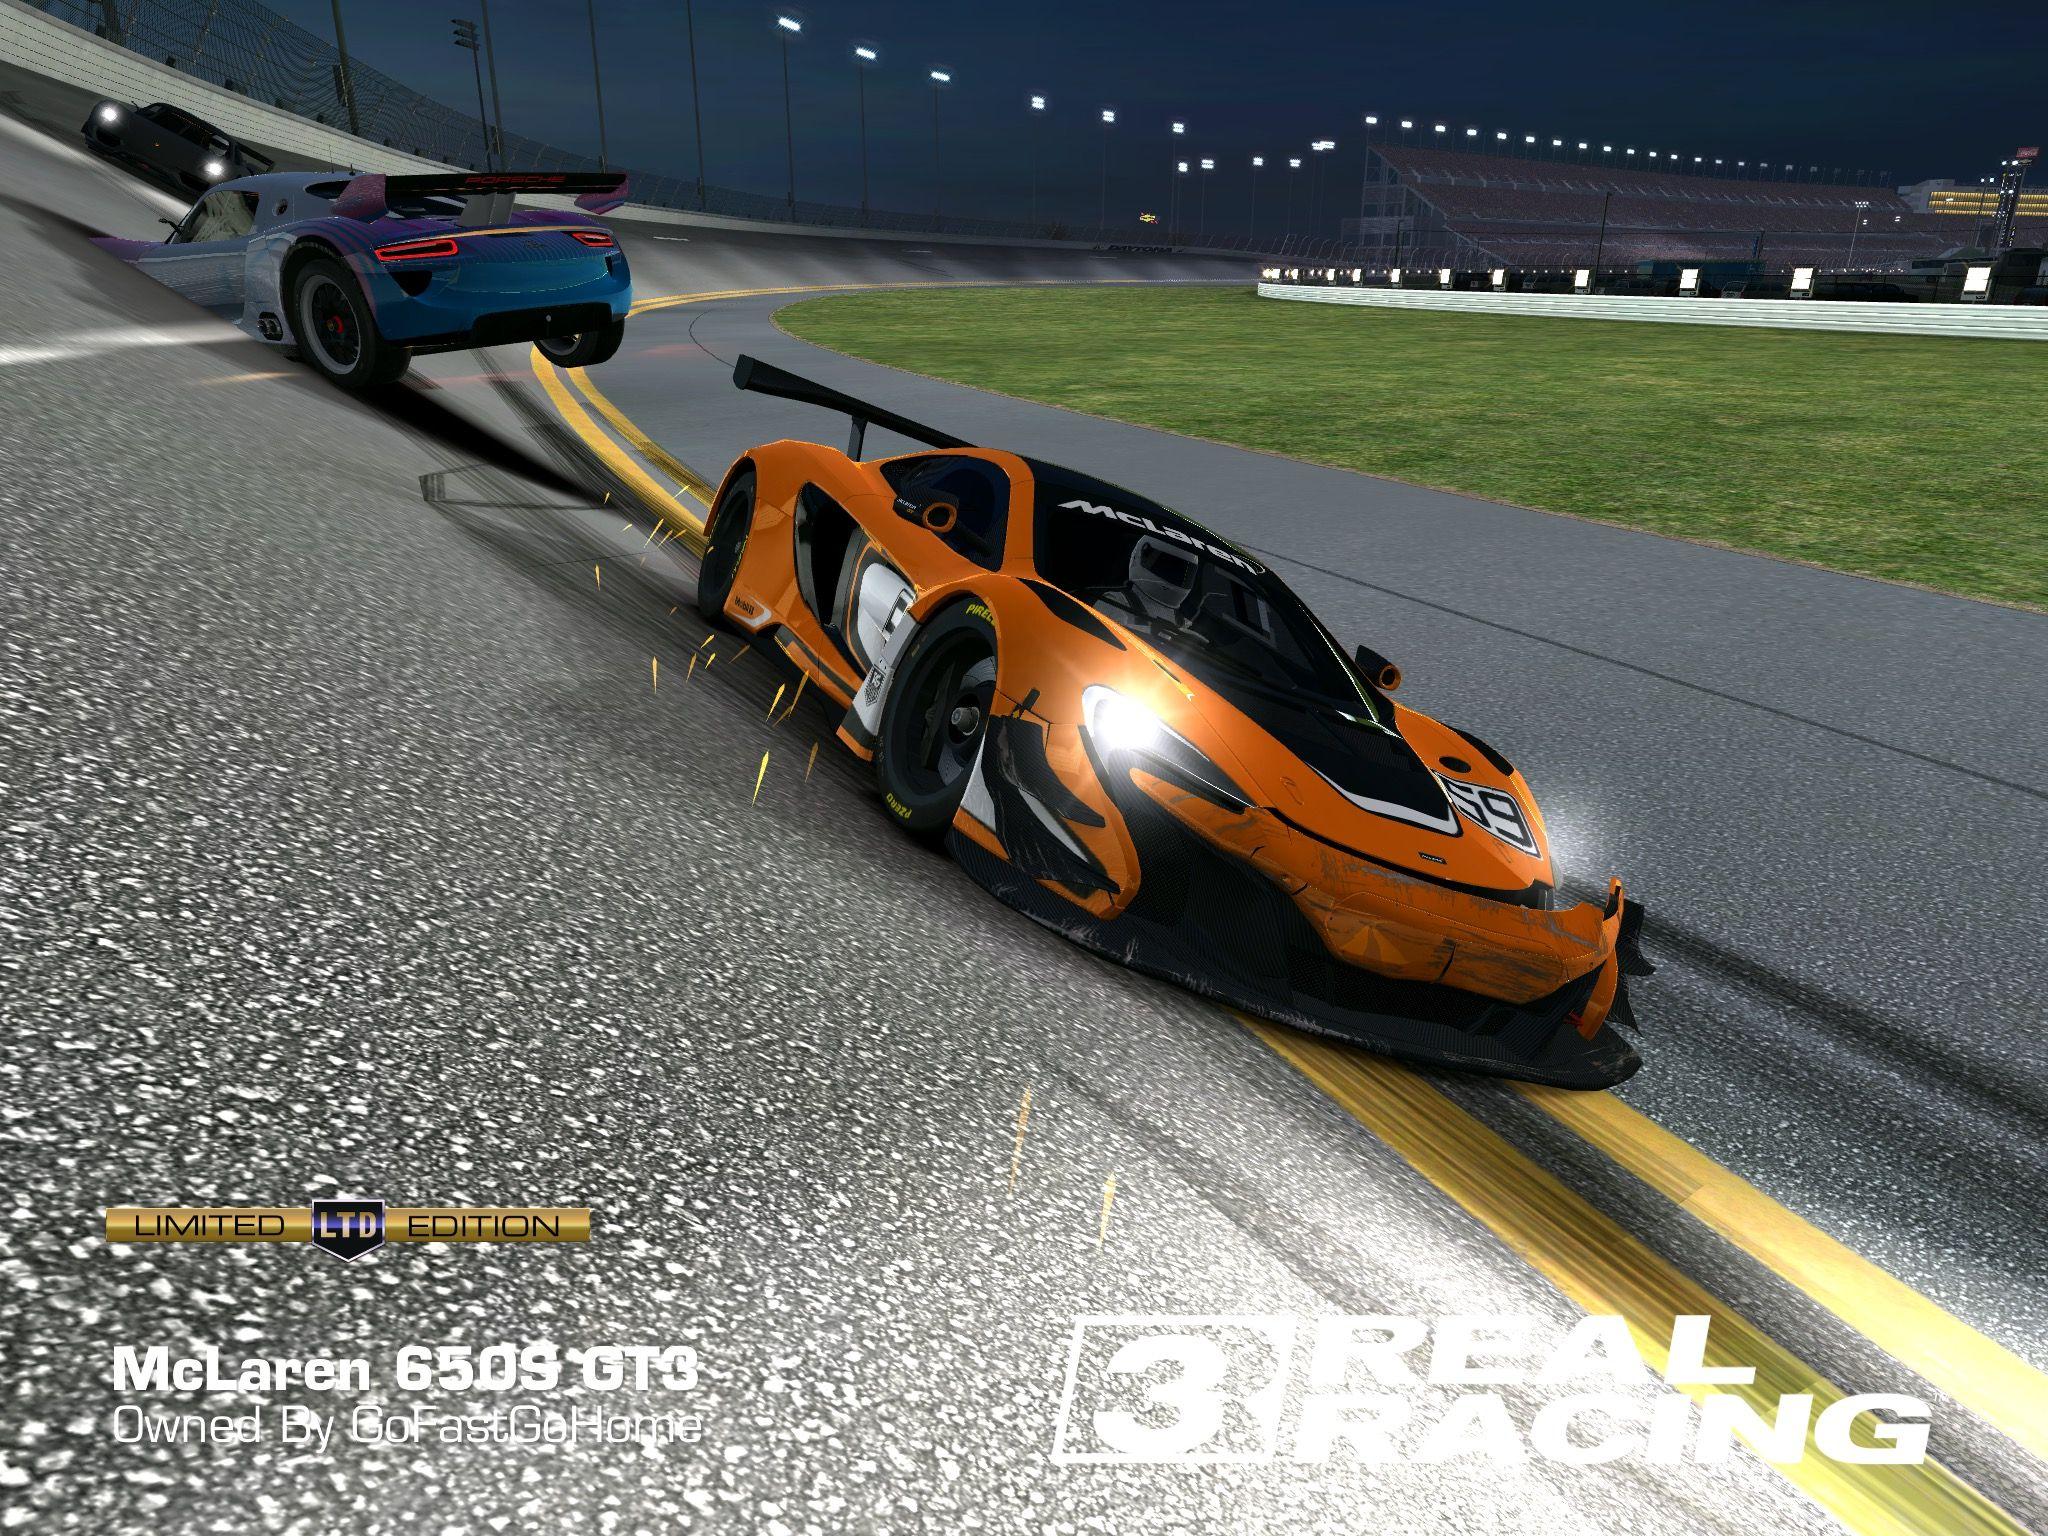 Pin By Damon On Real Racing 3 Cars Real Racing Racing Sports Car